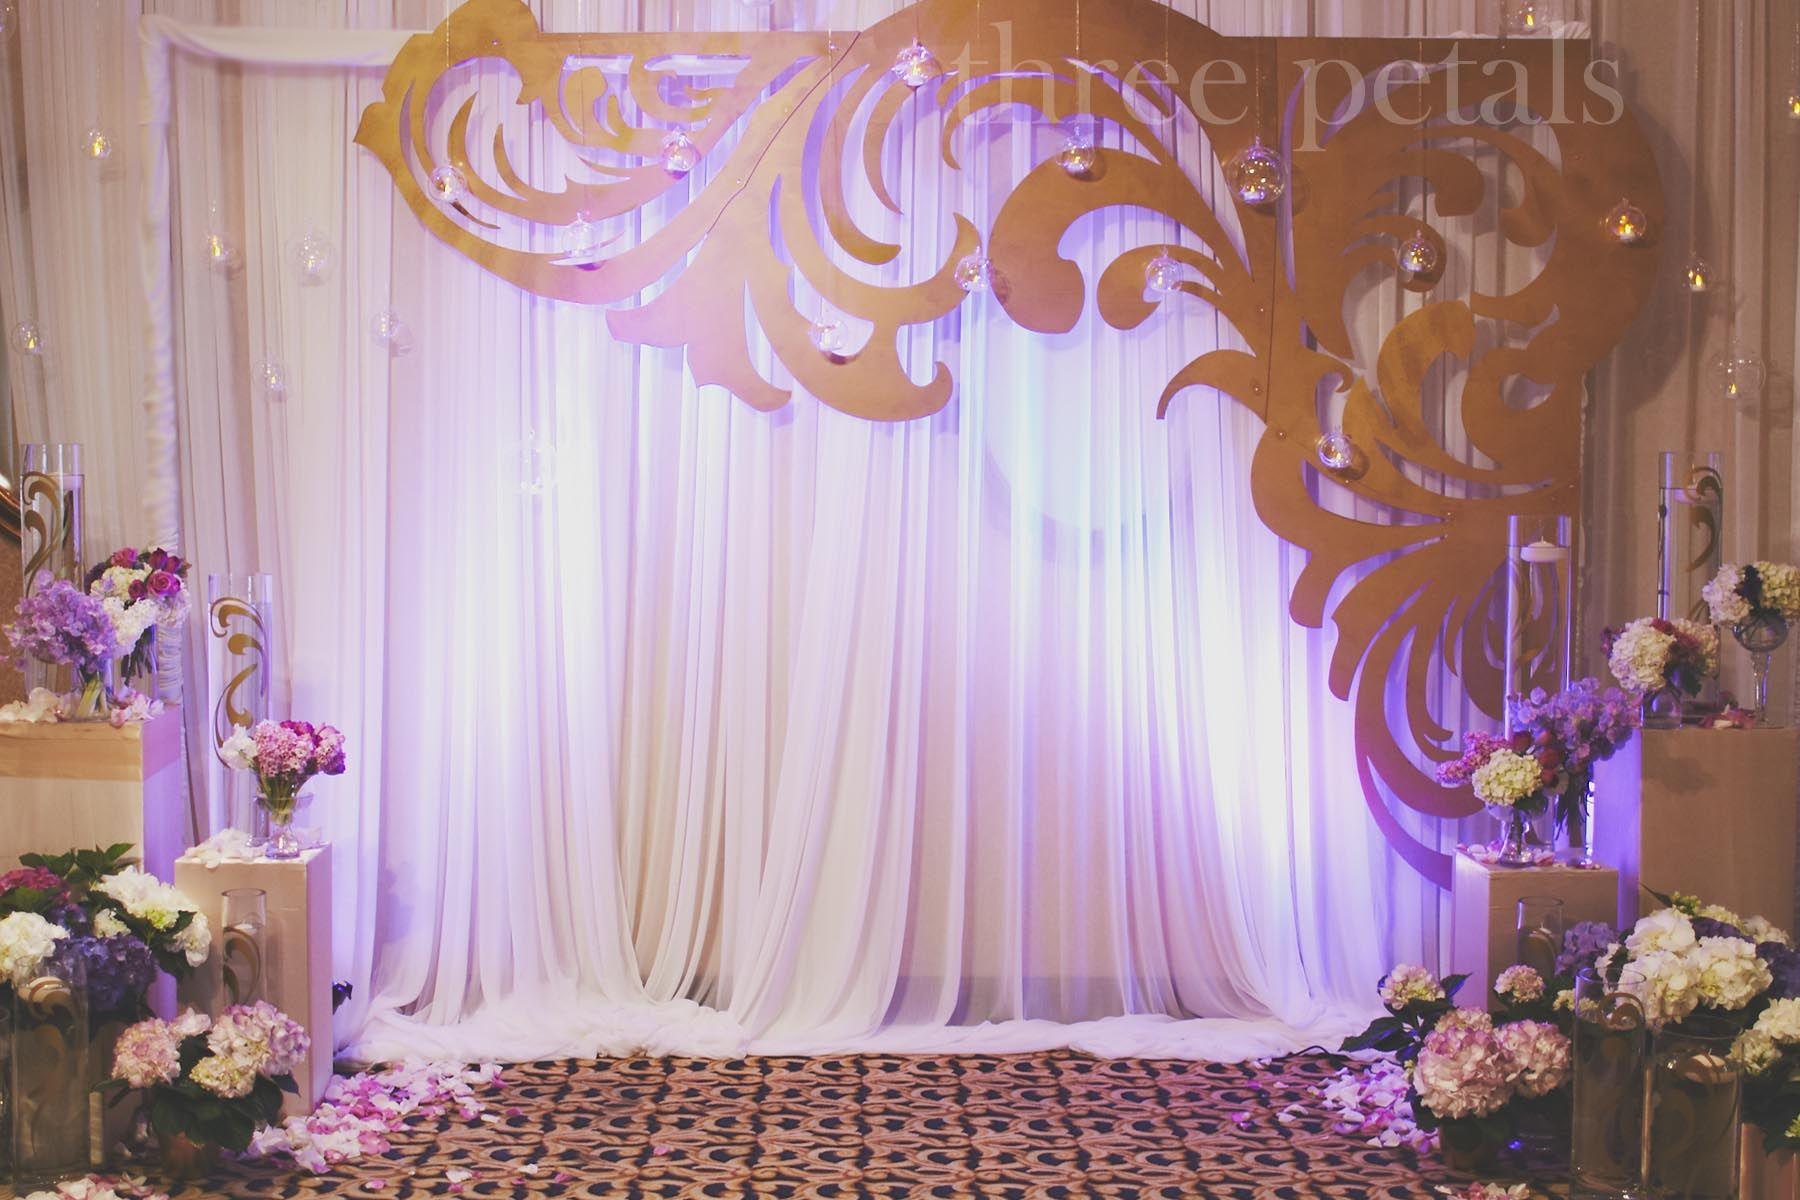 wedding backdrop with decorative